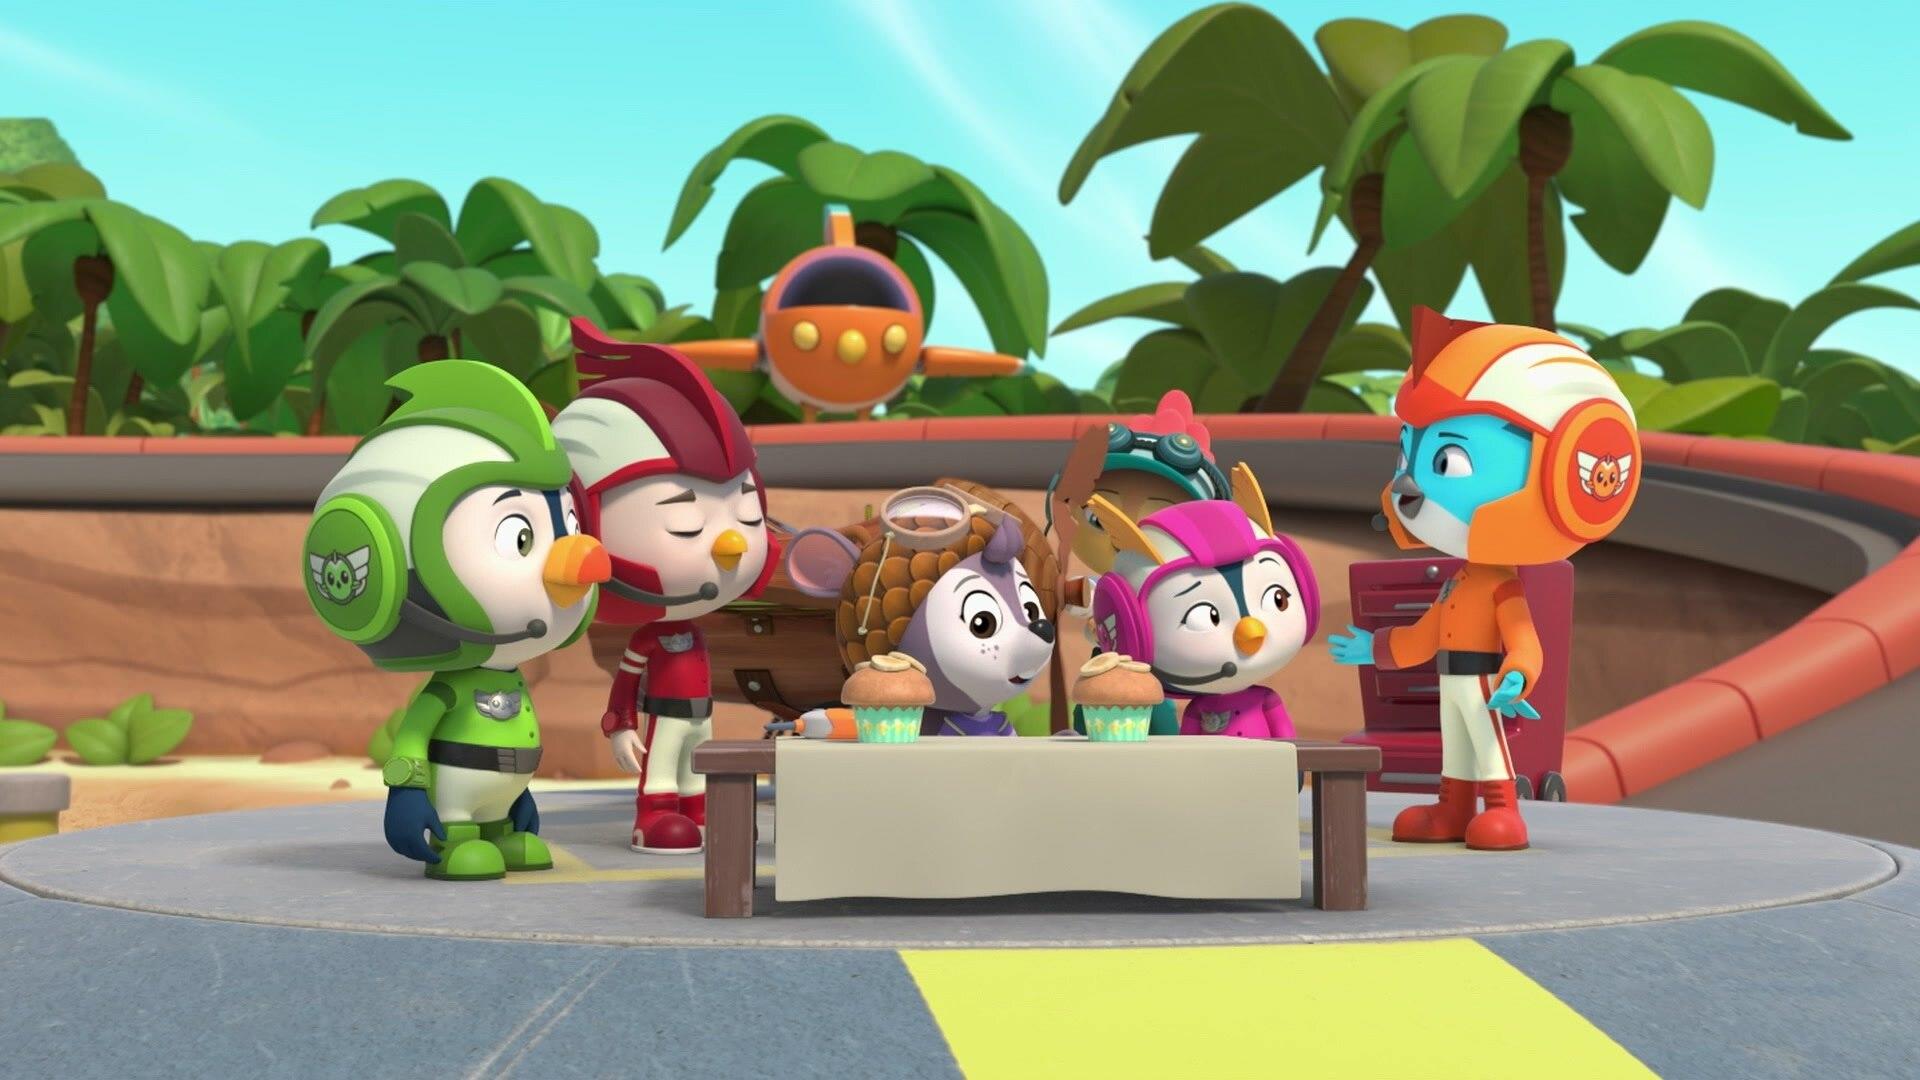 Flying Banana Bandits!/Penny's Chillin' Playdate